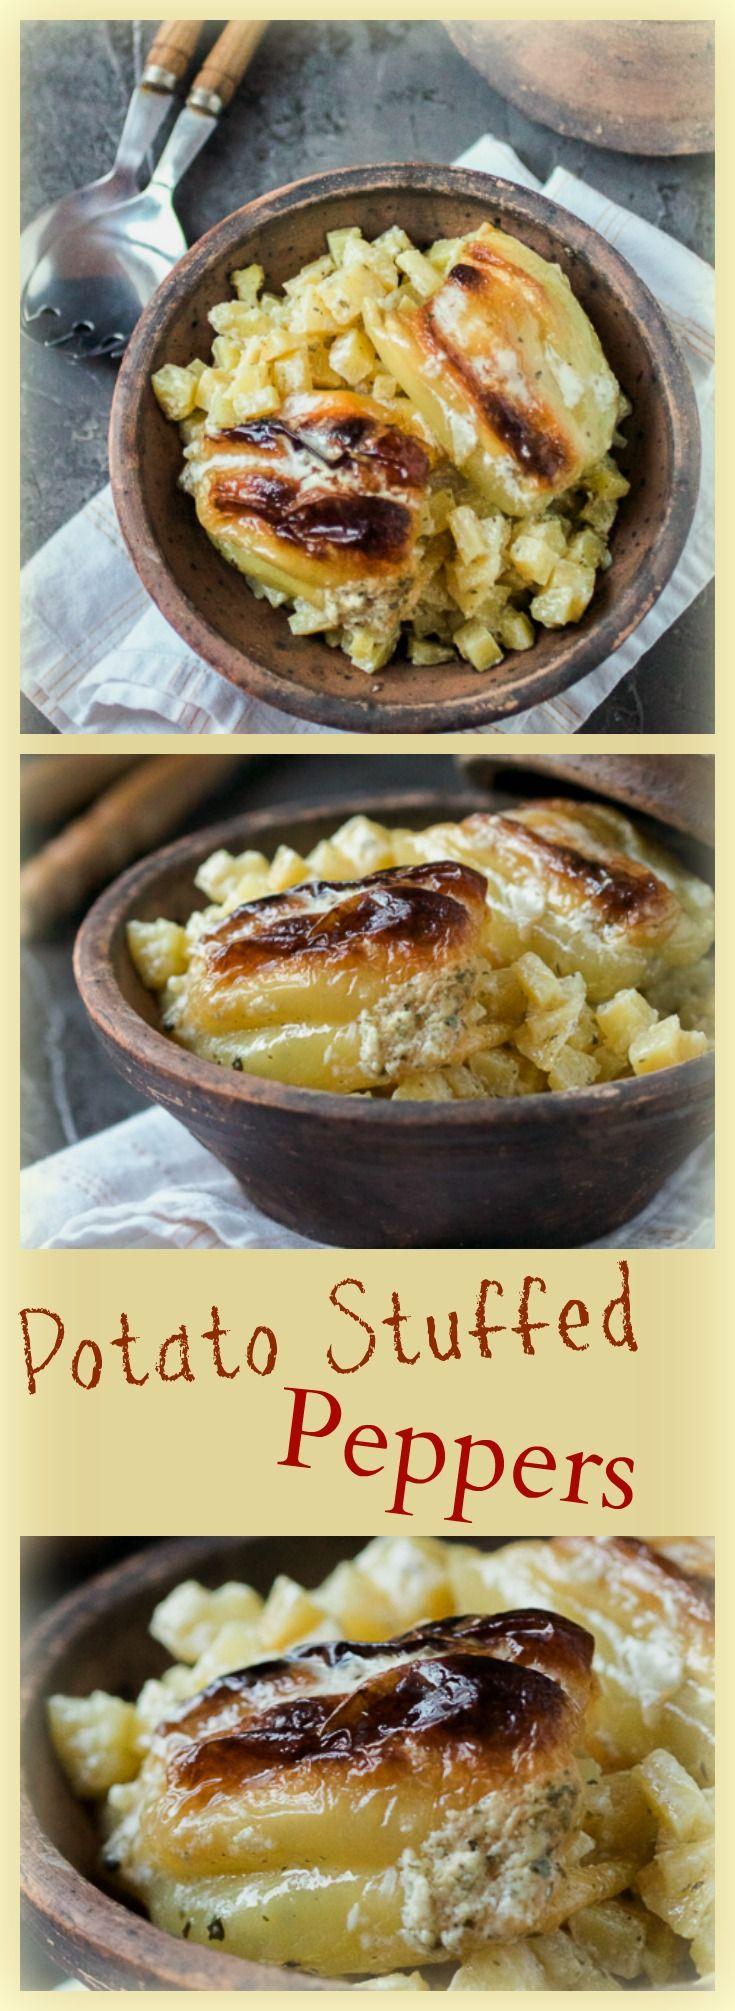 Potato stuffed peppers v2 paprike punjene krompirom v2 recipe bosnian food forumfinder Choice Image